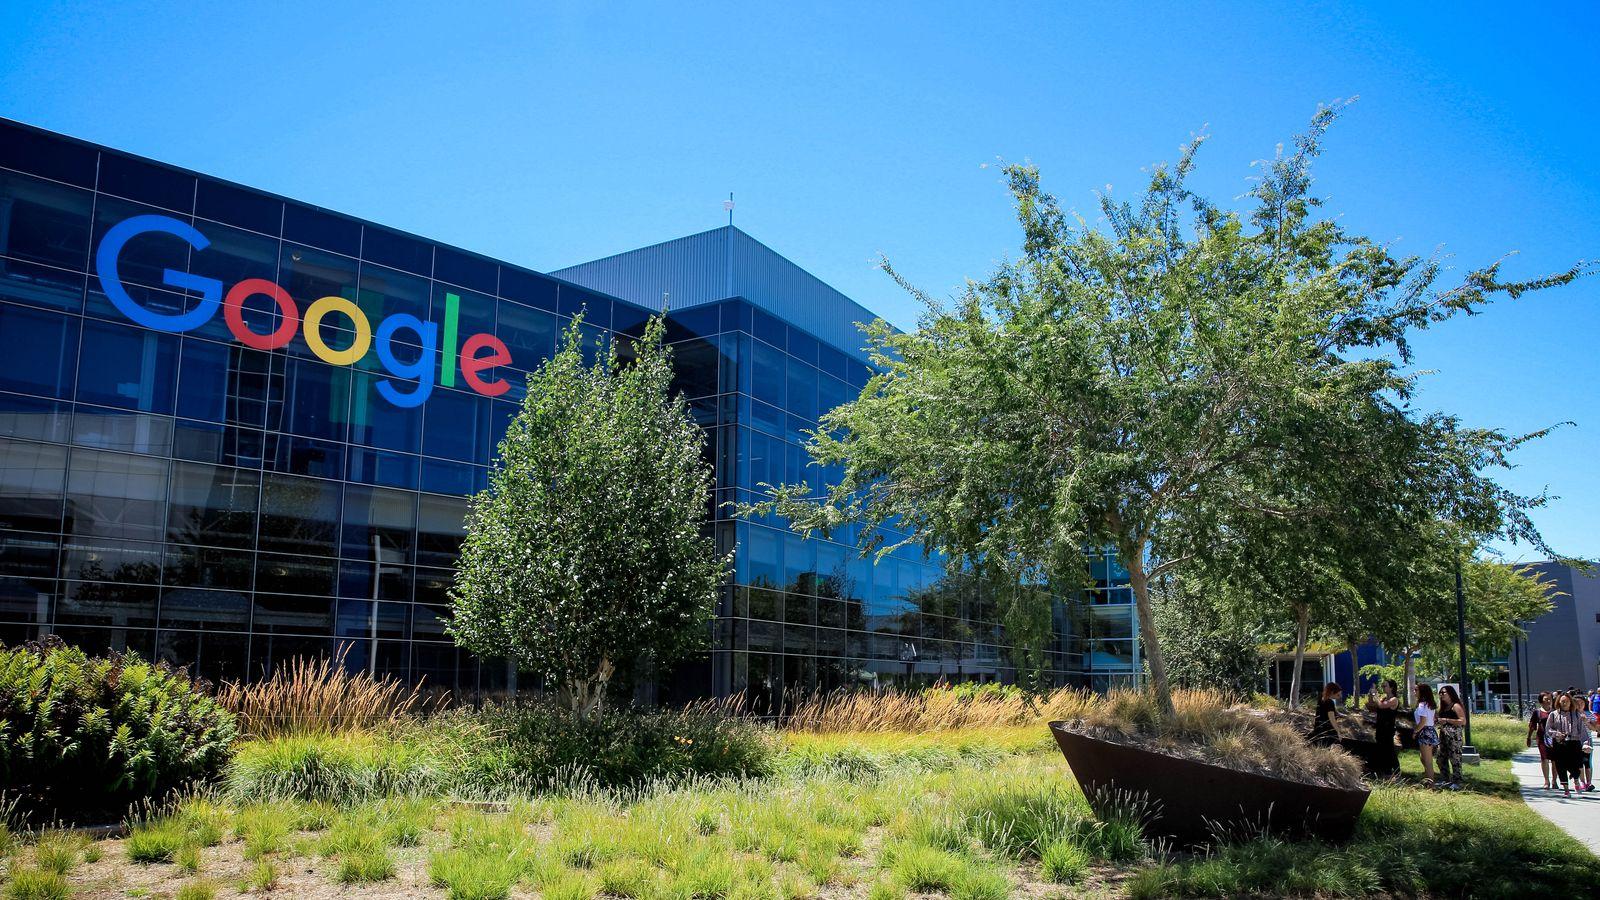 google stock - photo #13